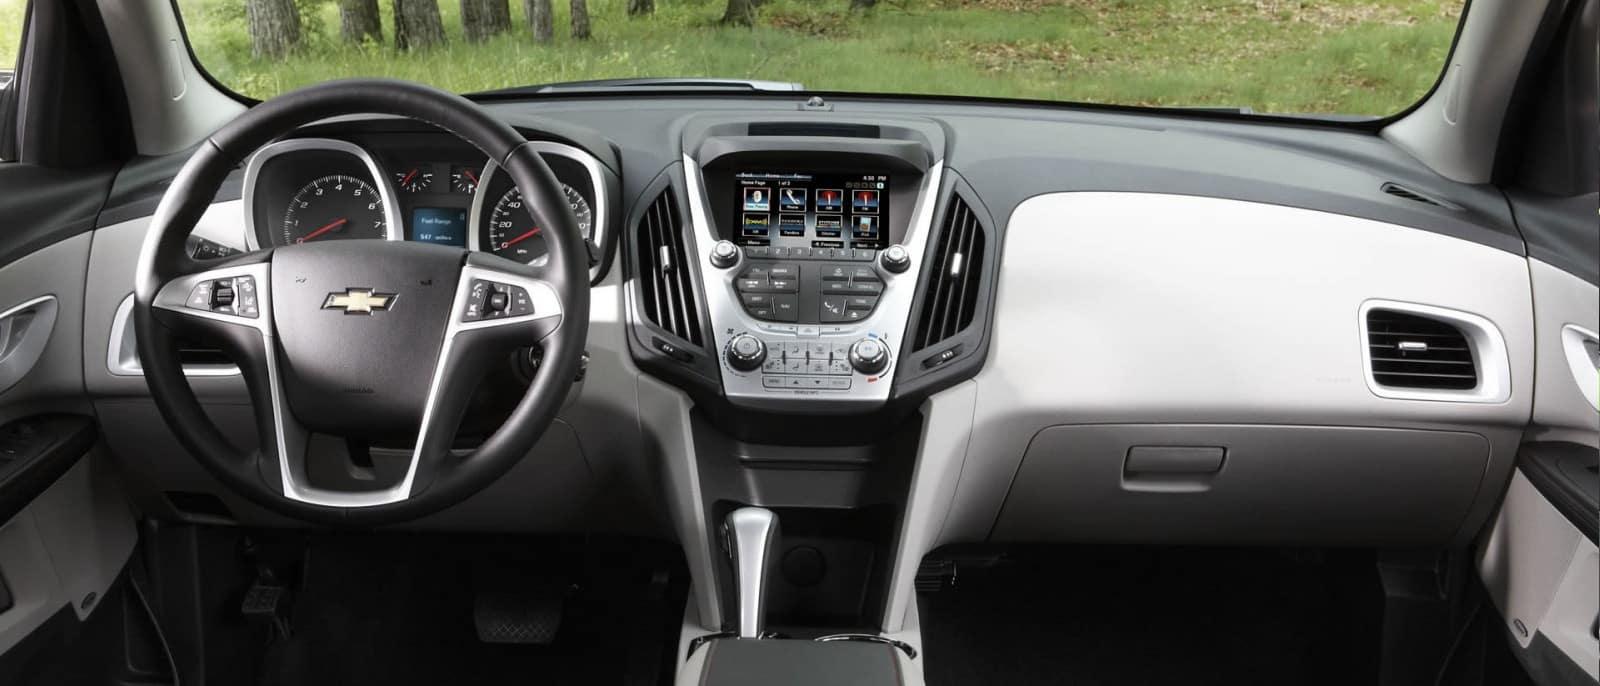 2014 Chevrolet Equinox Elgin Schaumburg | Biggers Chevy